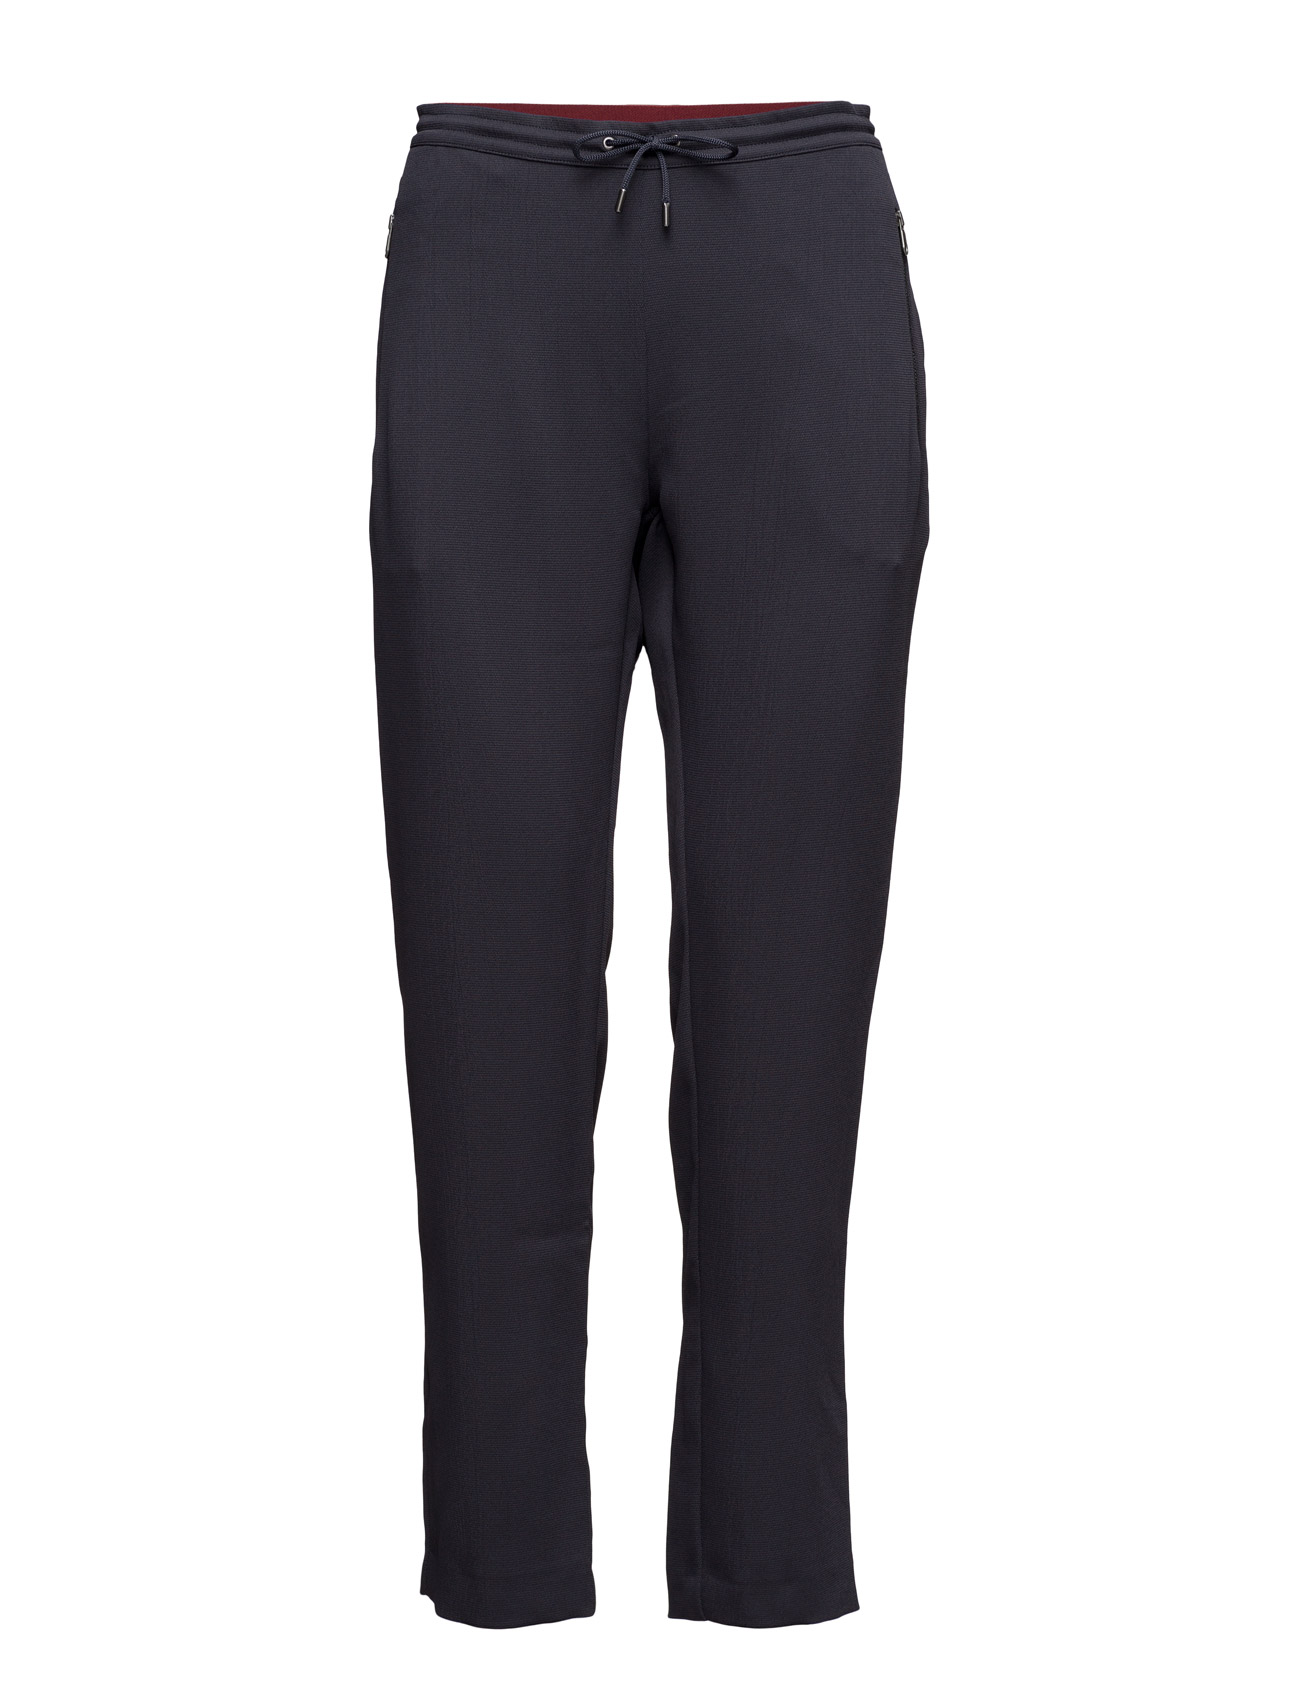 Avenue Pan Peak Performance Casual bukser til Kvinder i Sort